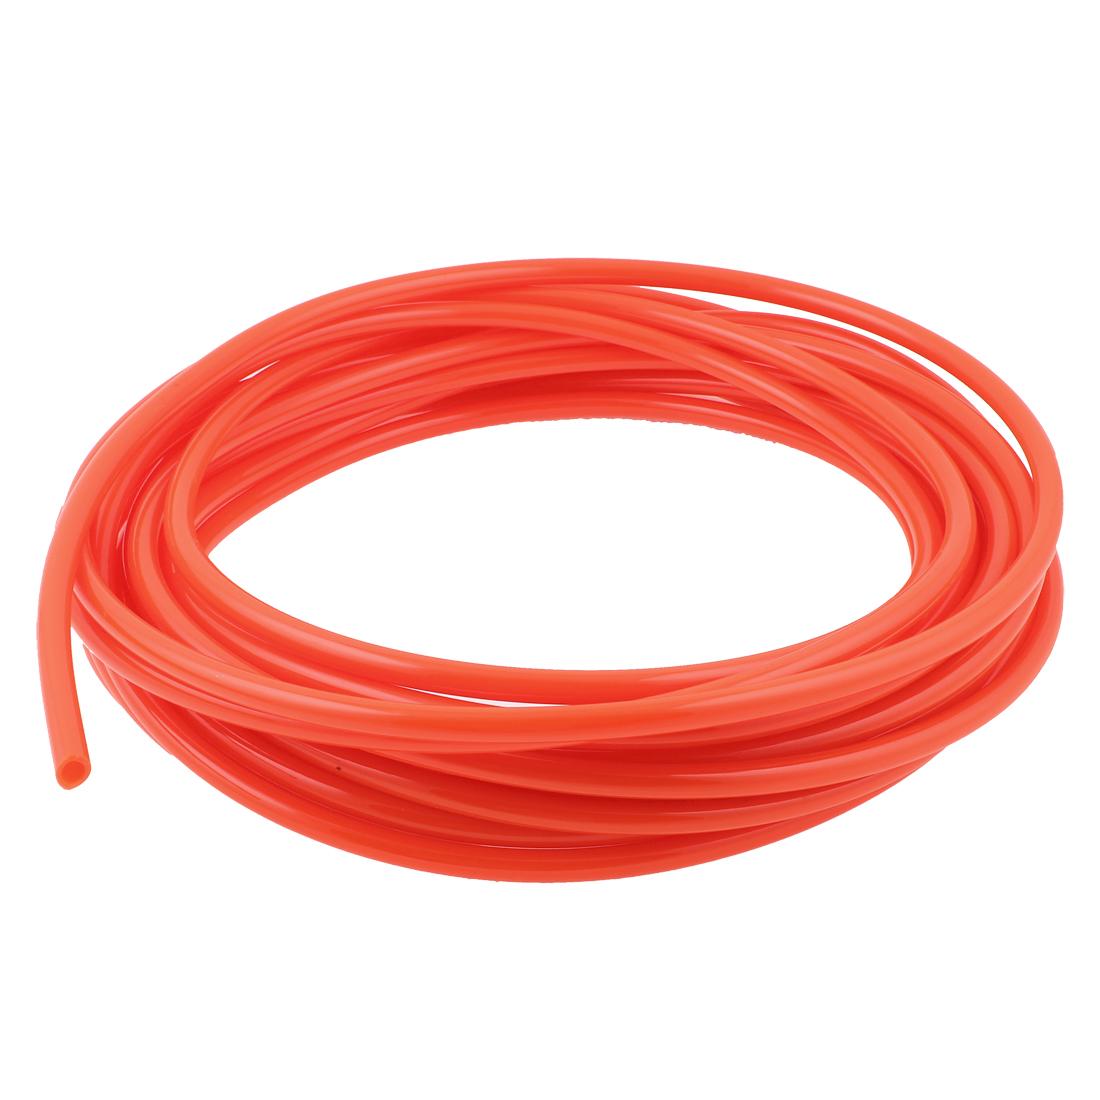 15M Long 10mmx6.5mm Air Fuel Gas Polyurethane Flexible PU Hose Tube Pipe Orange